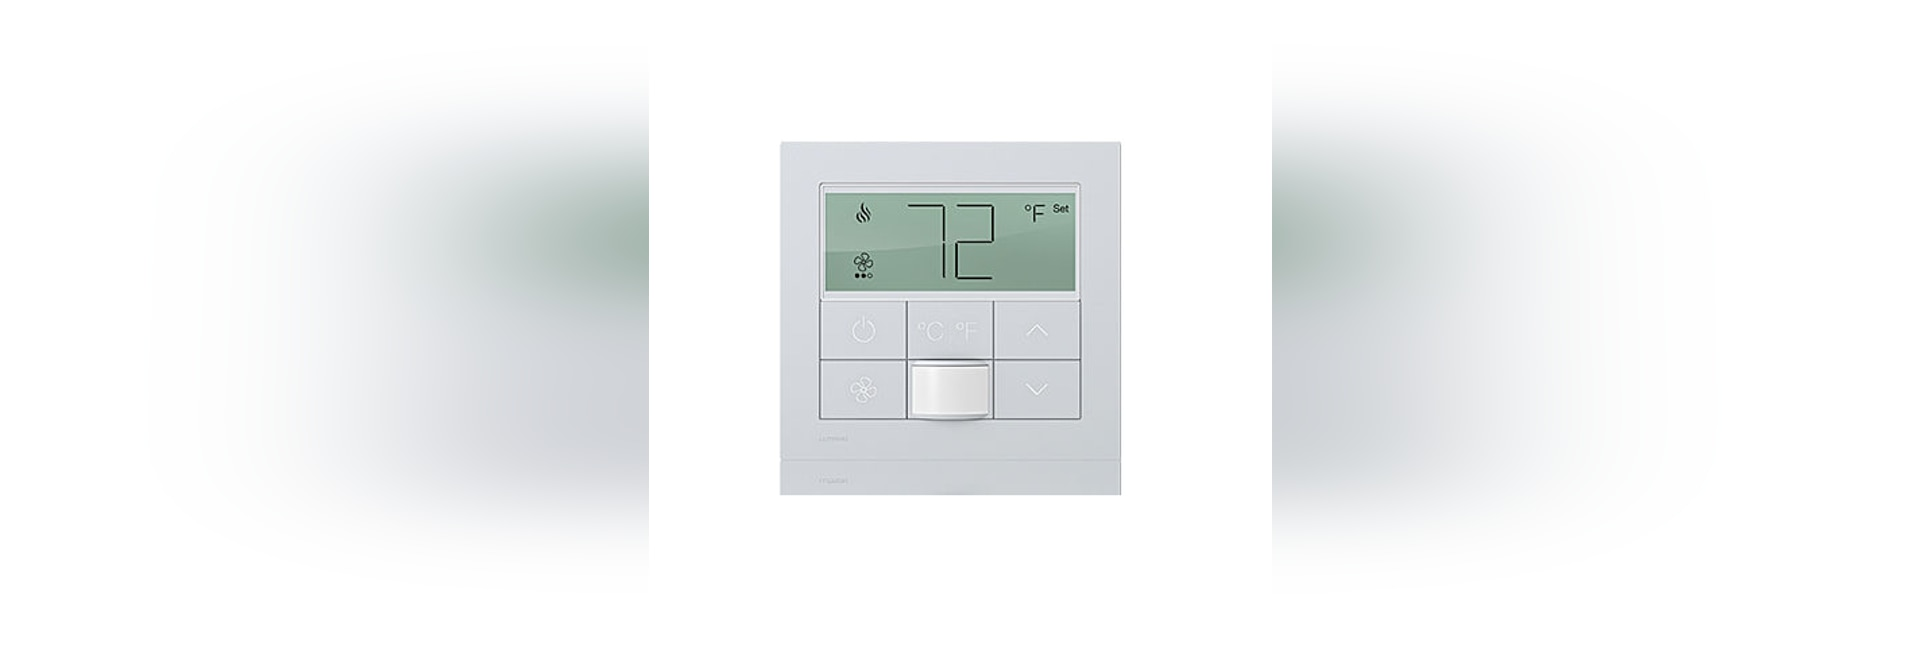 PALLADIOM QS digital thermostat by LUTRON ELECTRONICS - LUTRON ...